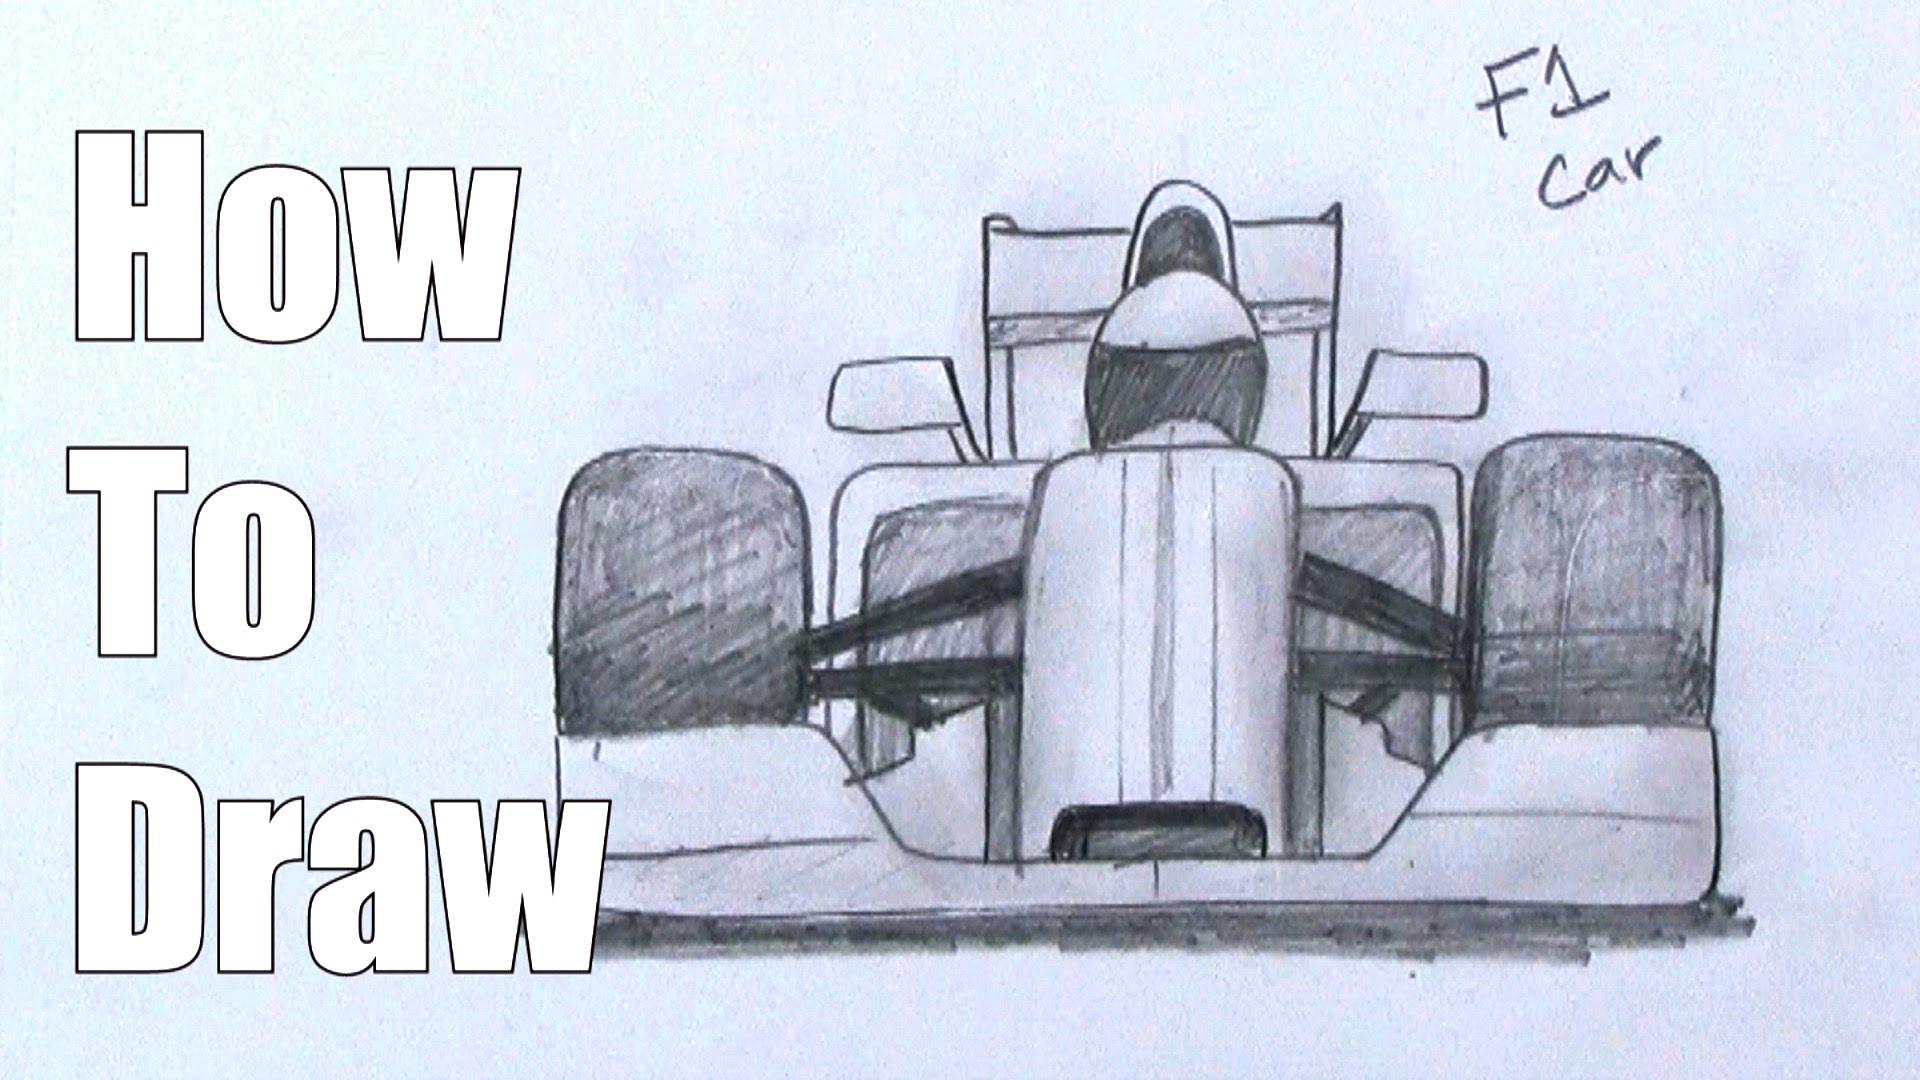 Drawn race car Car Draw F1 an